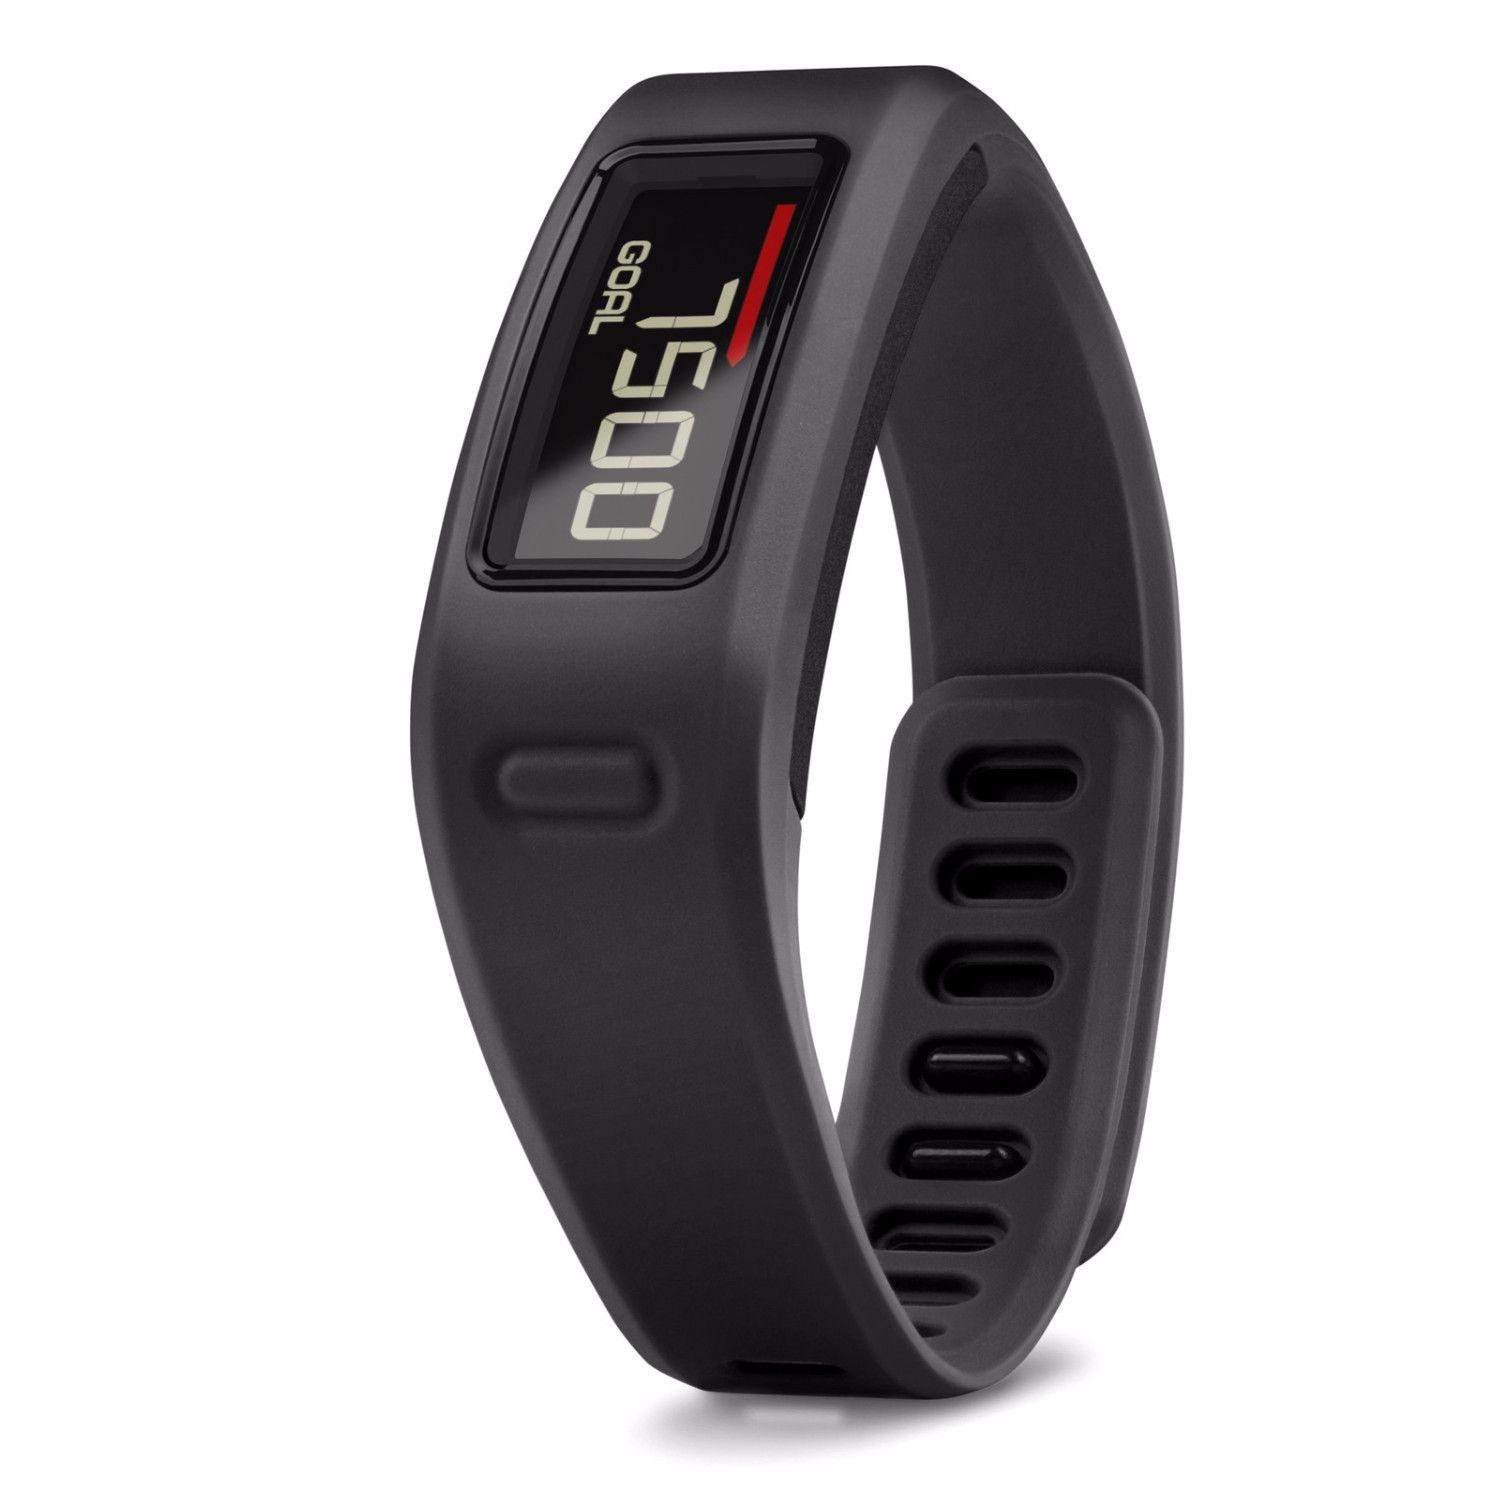 Garmin Vivofit Fitness Activity and Sleep Tracker